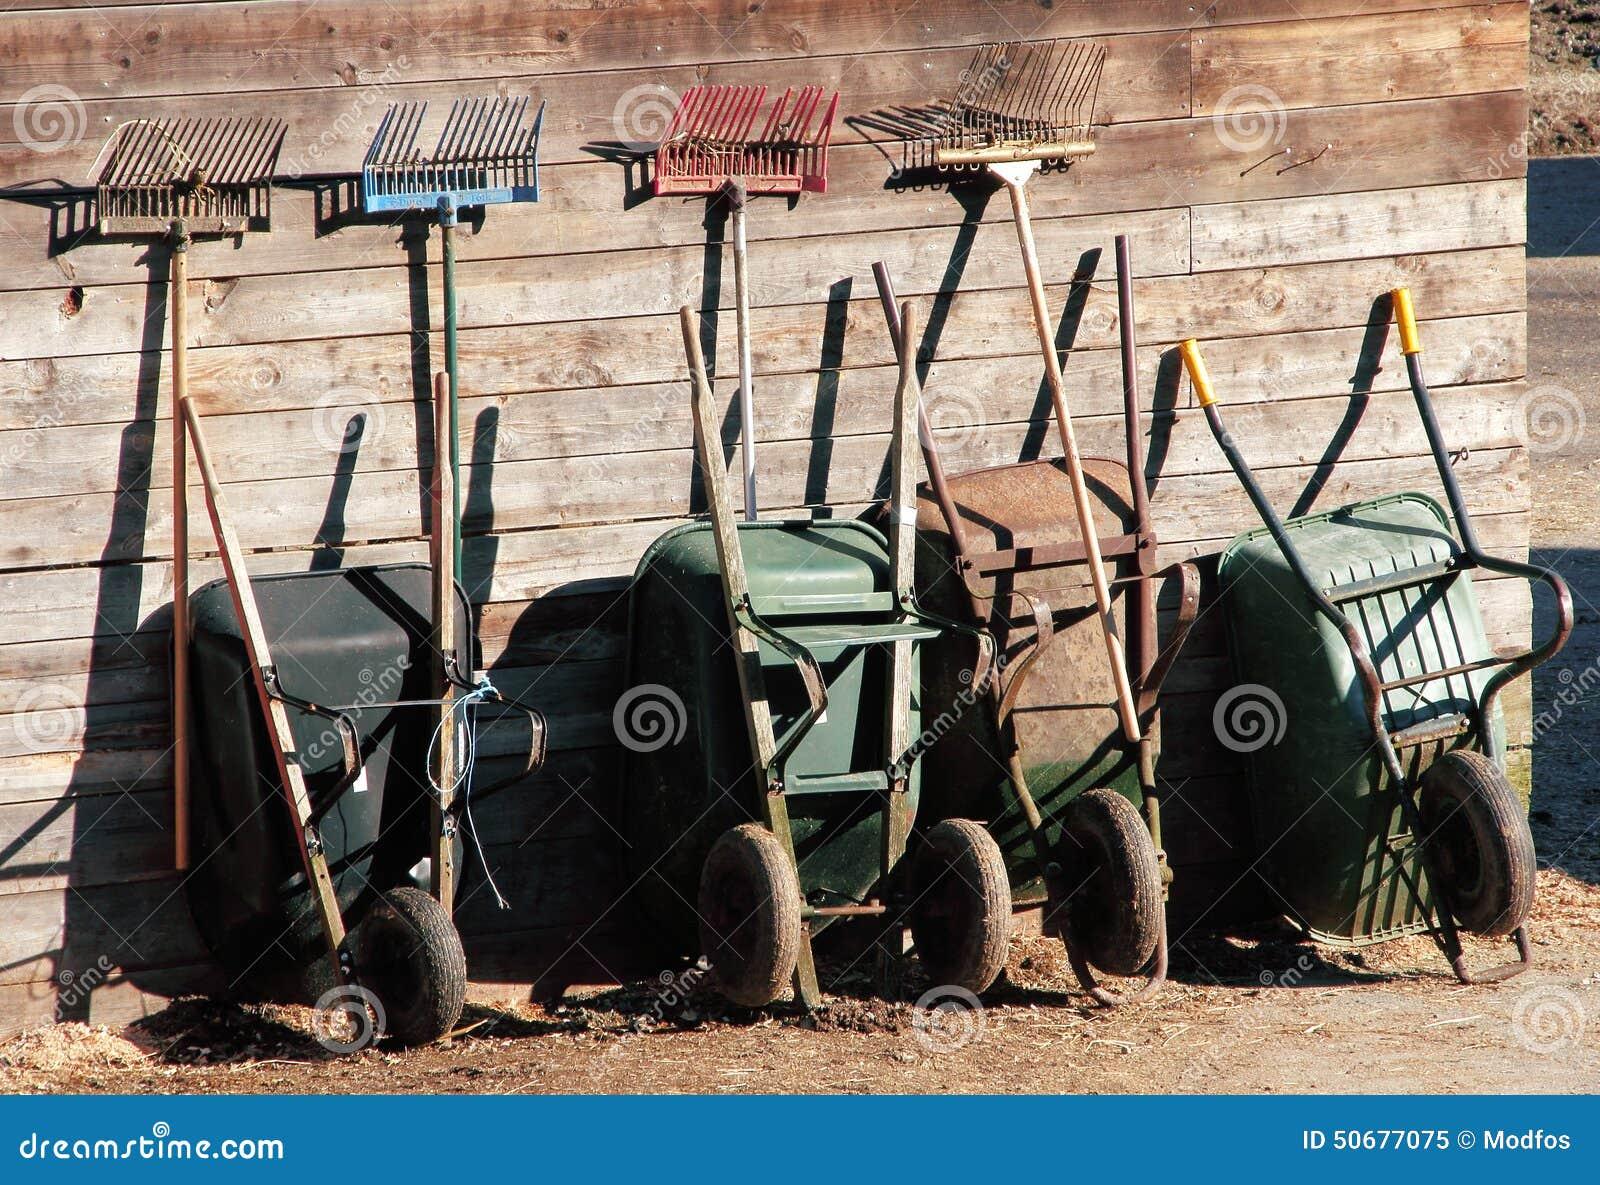 Download 整洁地排队的园艺工具 库存图片. 图片 包括有 组织, 房子, 室外, 工具, 家庭, 庭院, 从事园艺 - 50677075